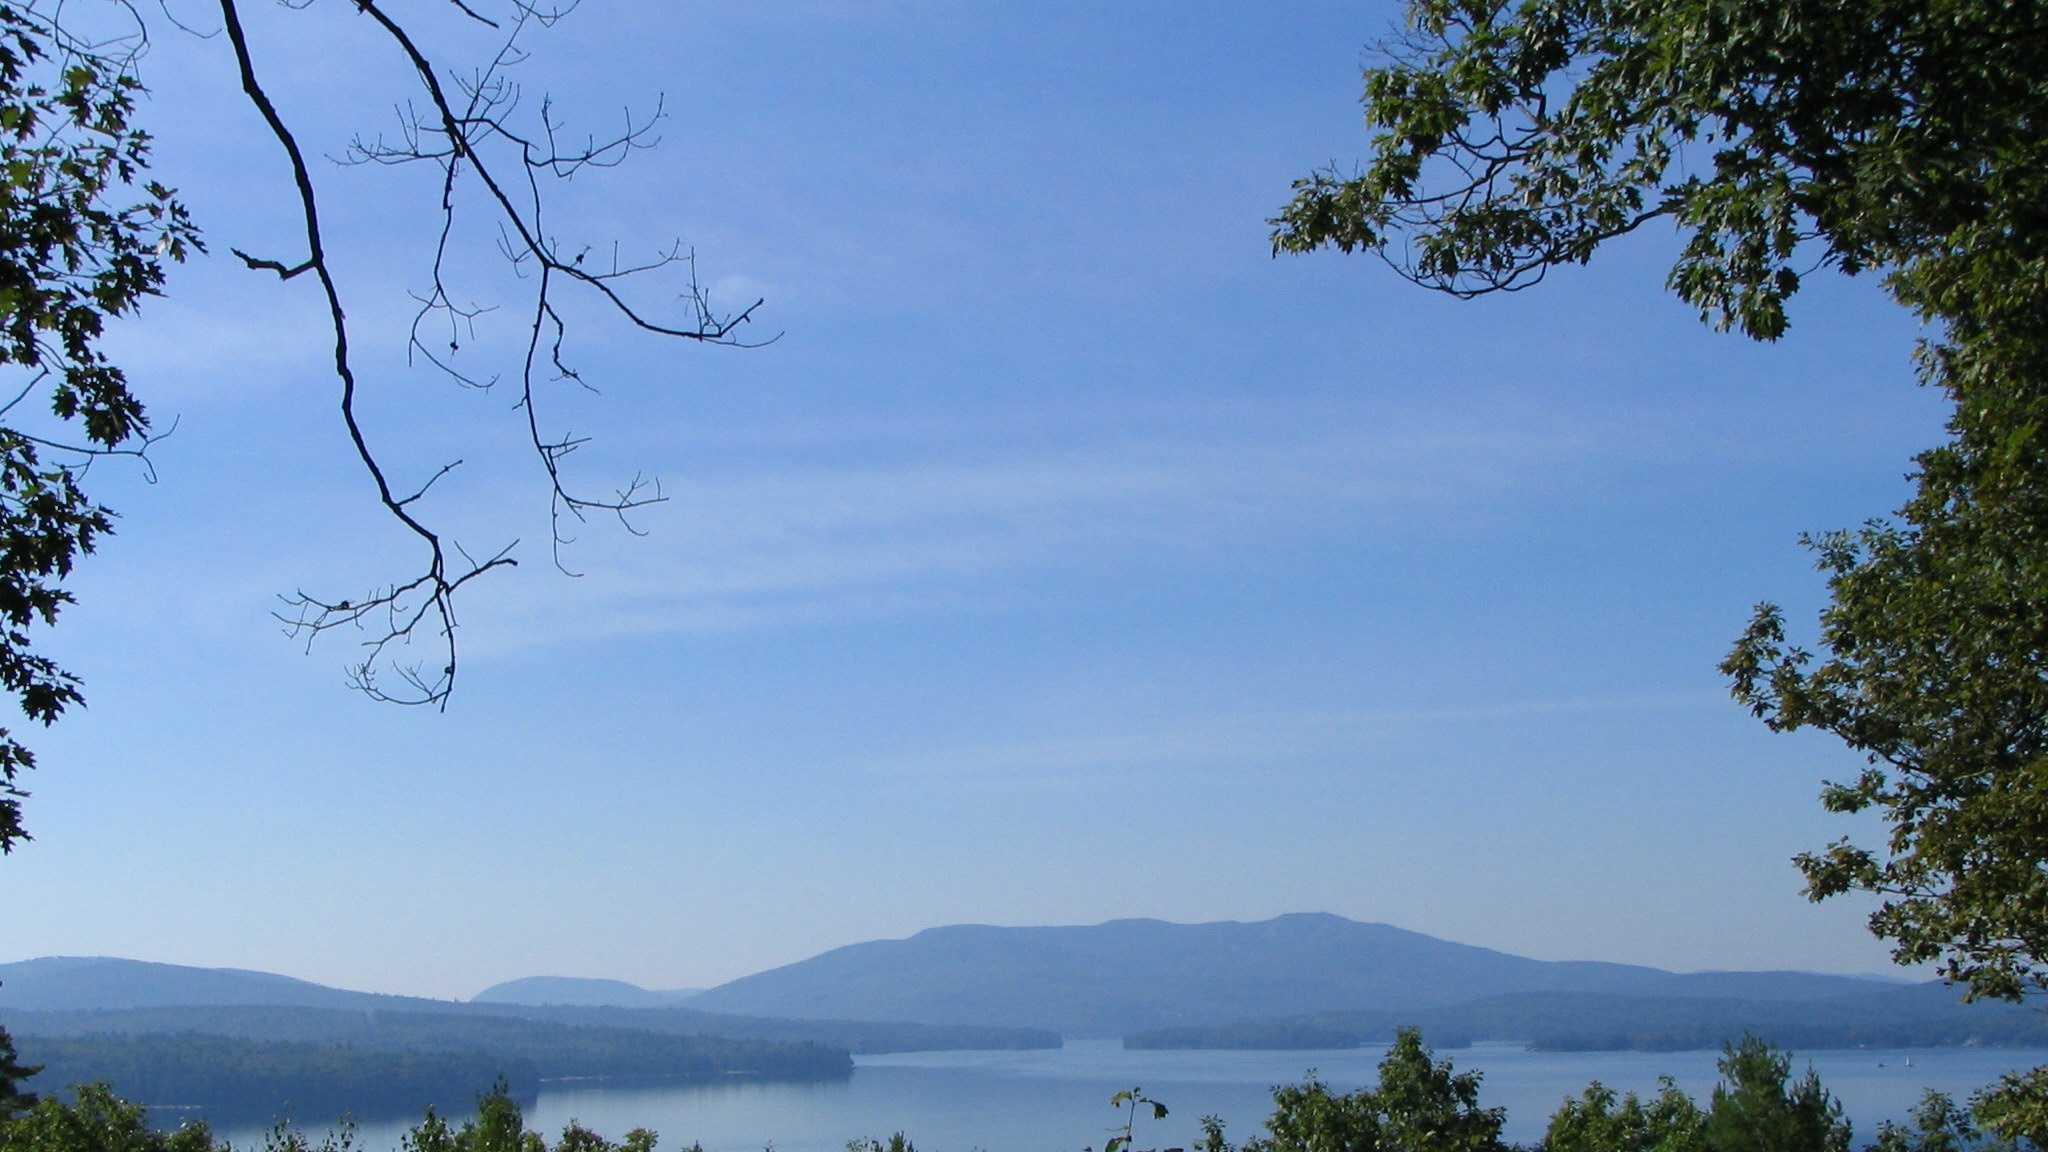 Clark, Lake Sunapee